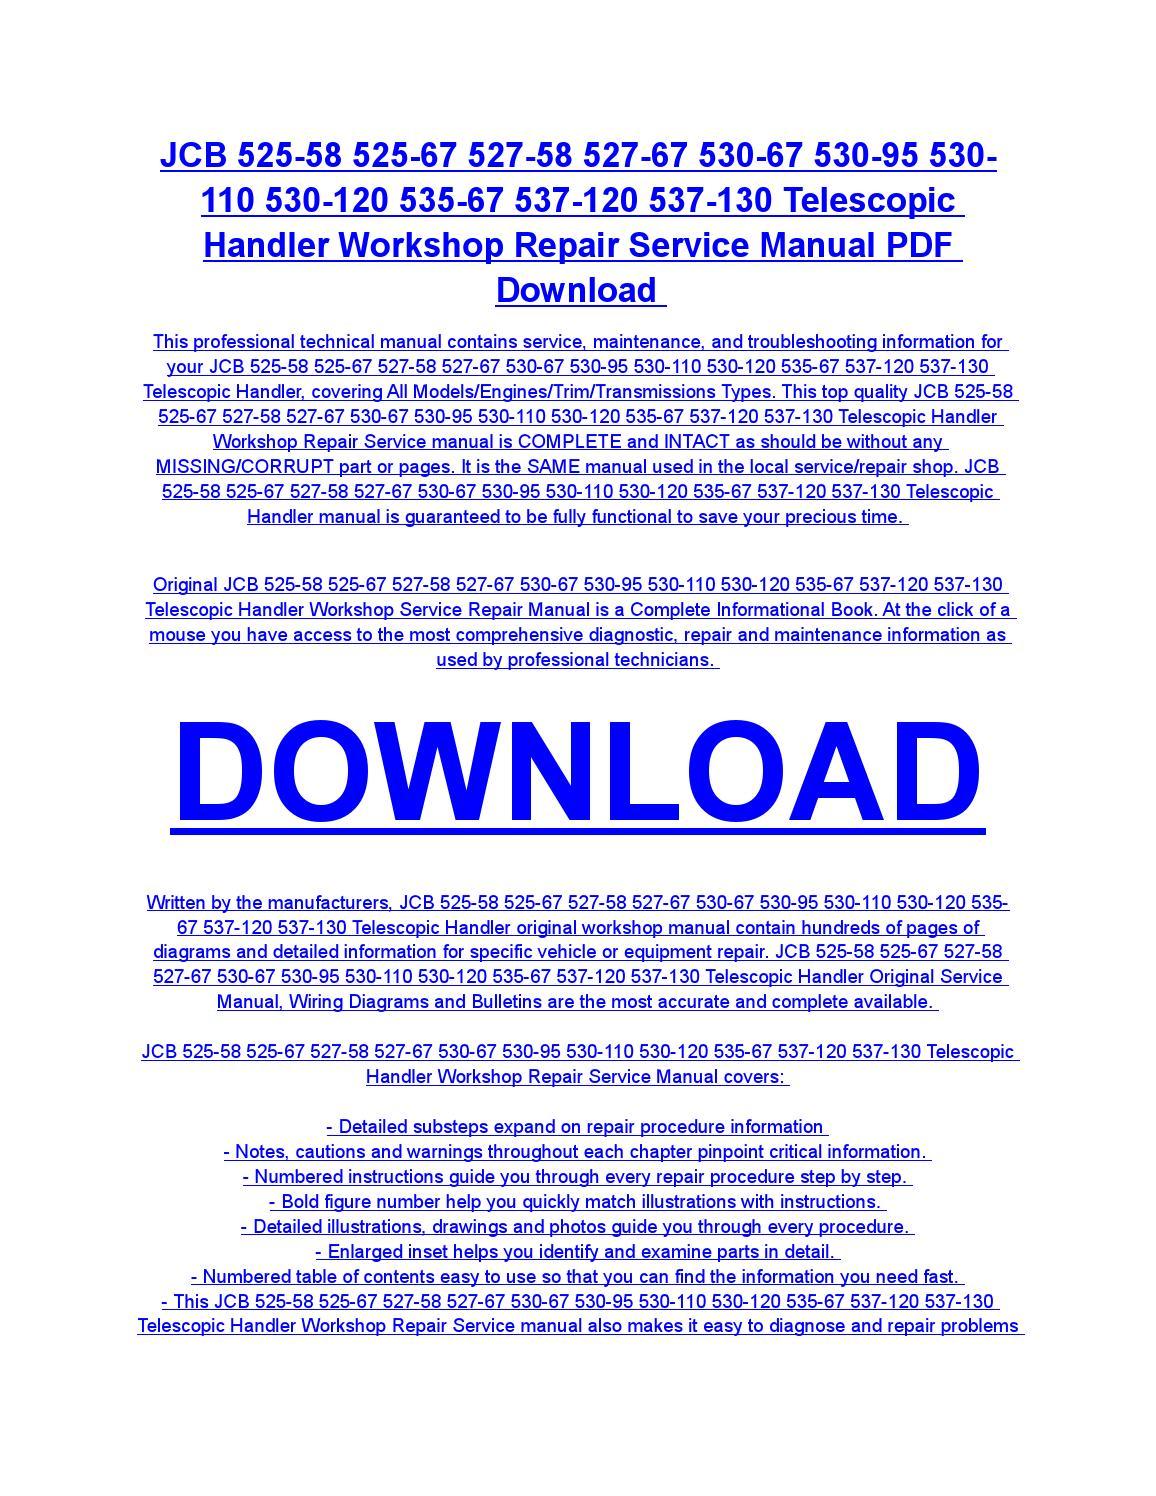 Jcb 525 58 525 67 527 58 527 67 530 67 530 95 530 110 530 120 535 67 537  120 537 130 telescopic hand by diaz rondon - issuu